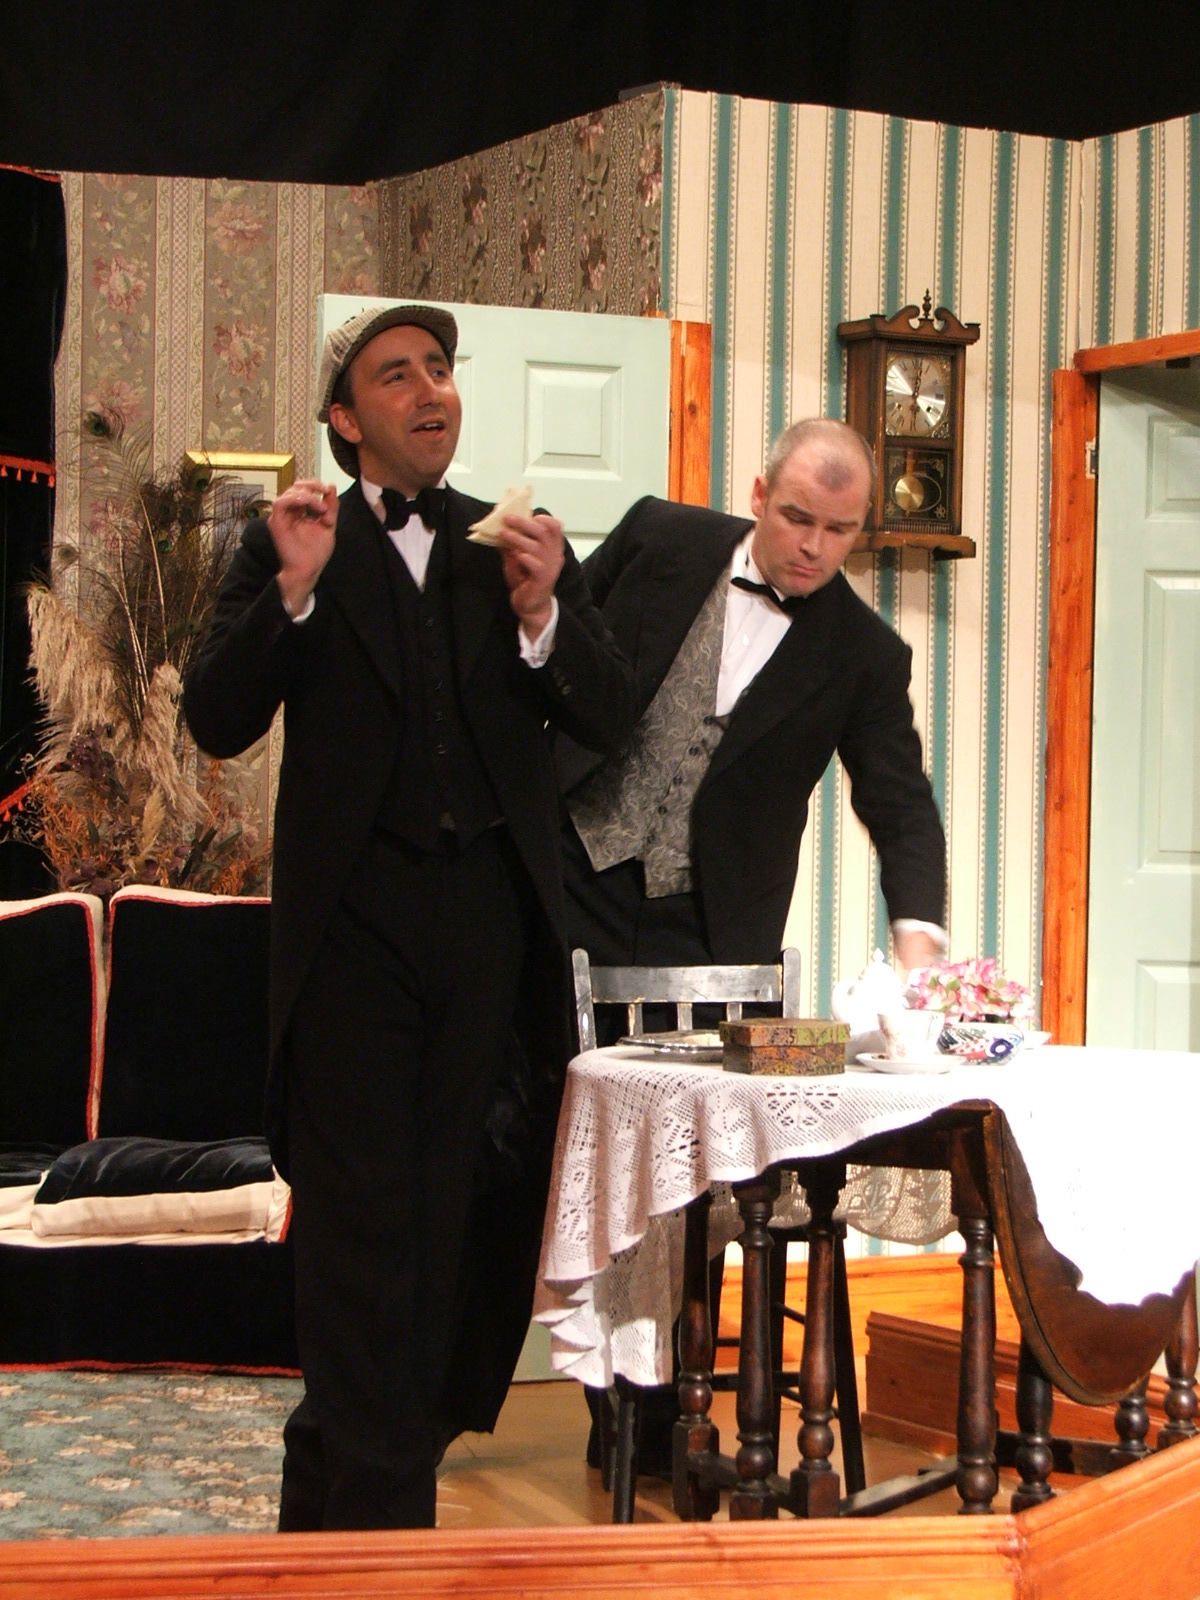 Holmes, Watson & teatime